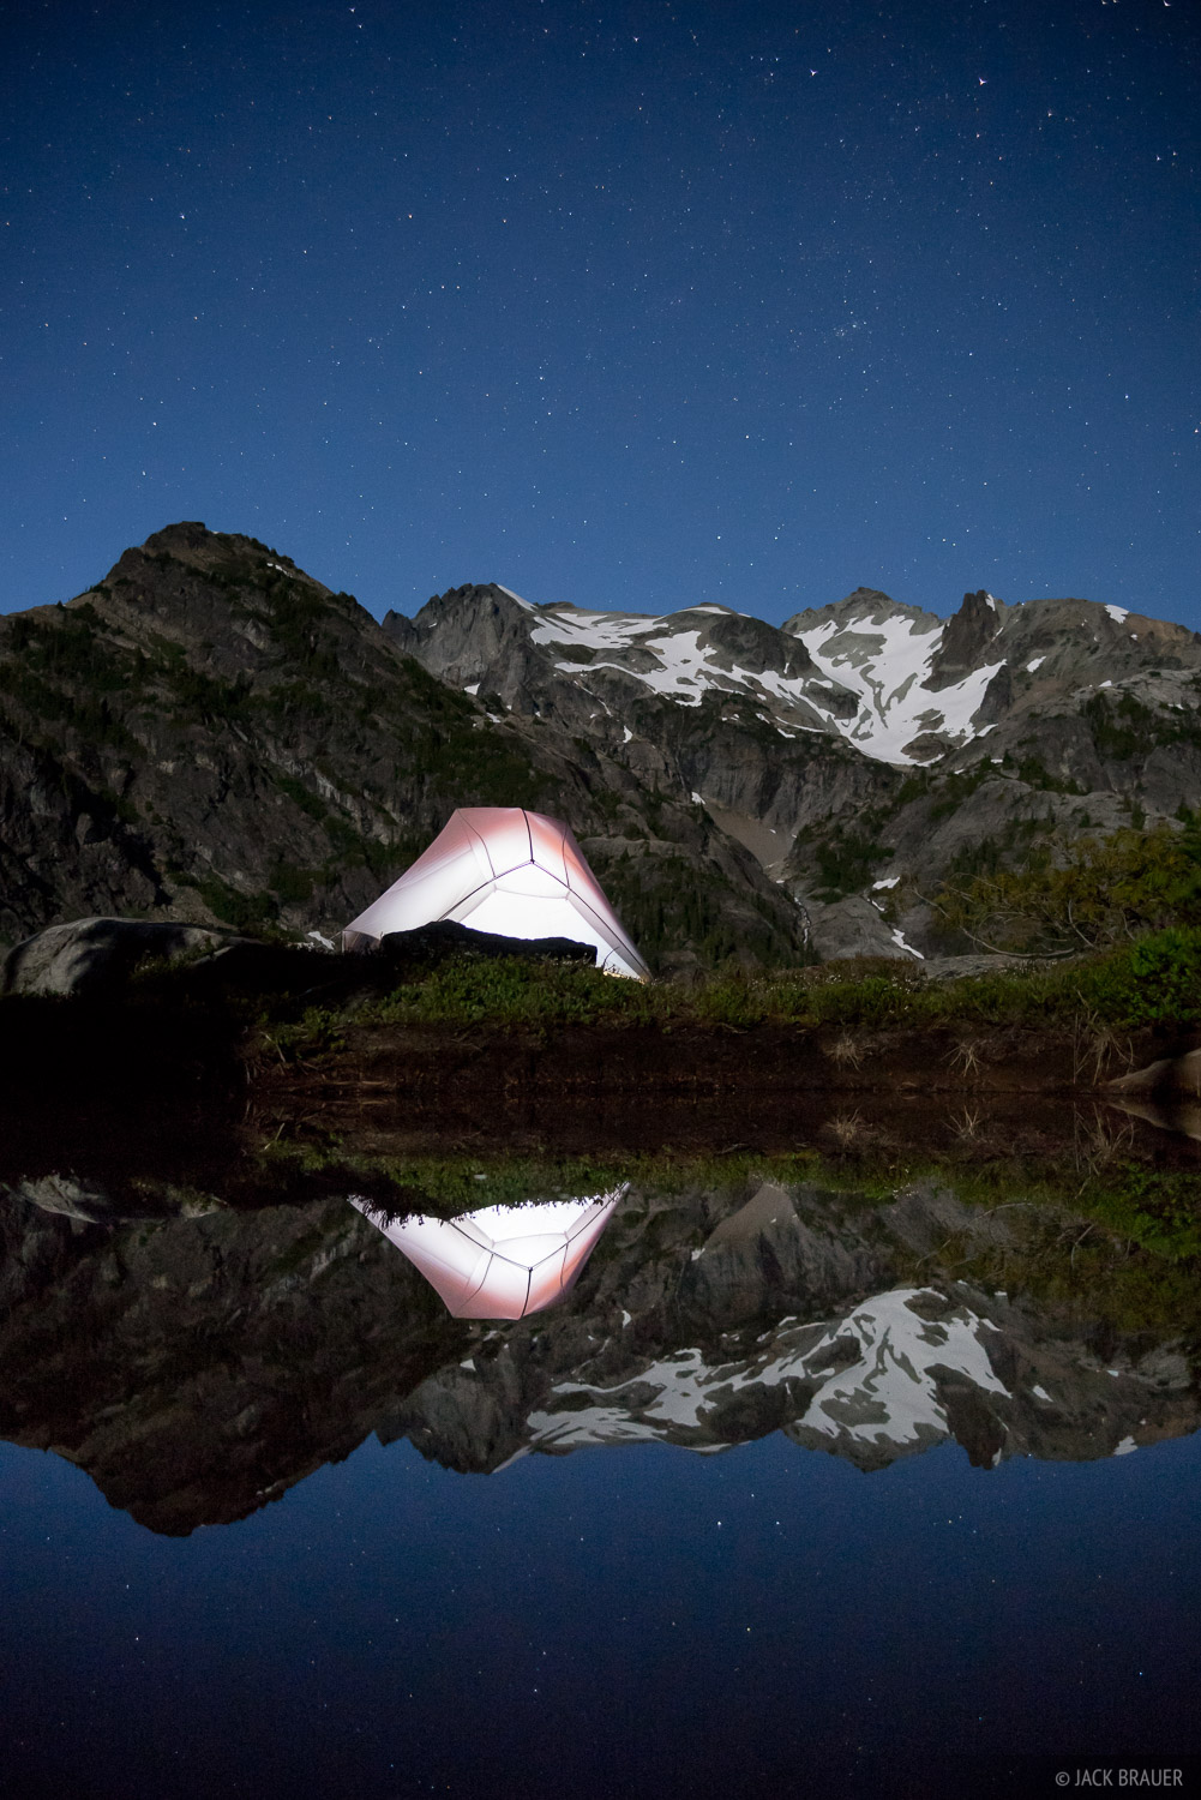 Alpine Lakes Wilderness, Mount Daniel, Spade Lake, Washington, moonlight, tent, Cascades, July, Washington Cascades, night, 2016...